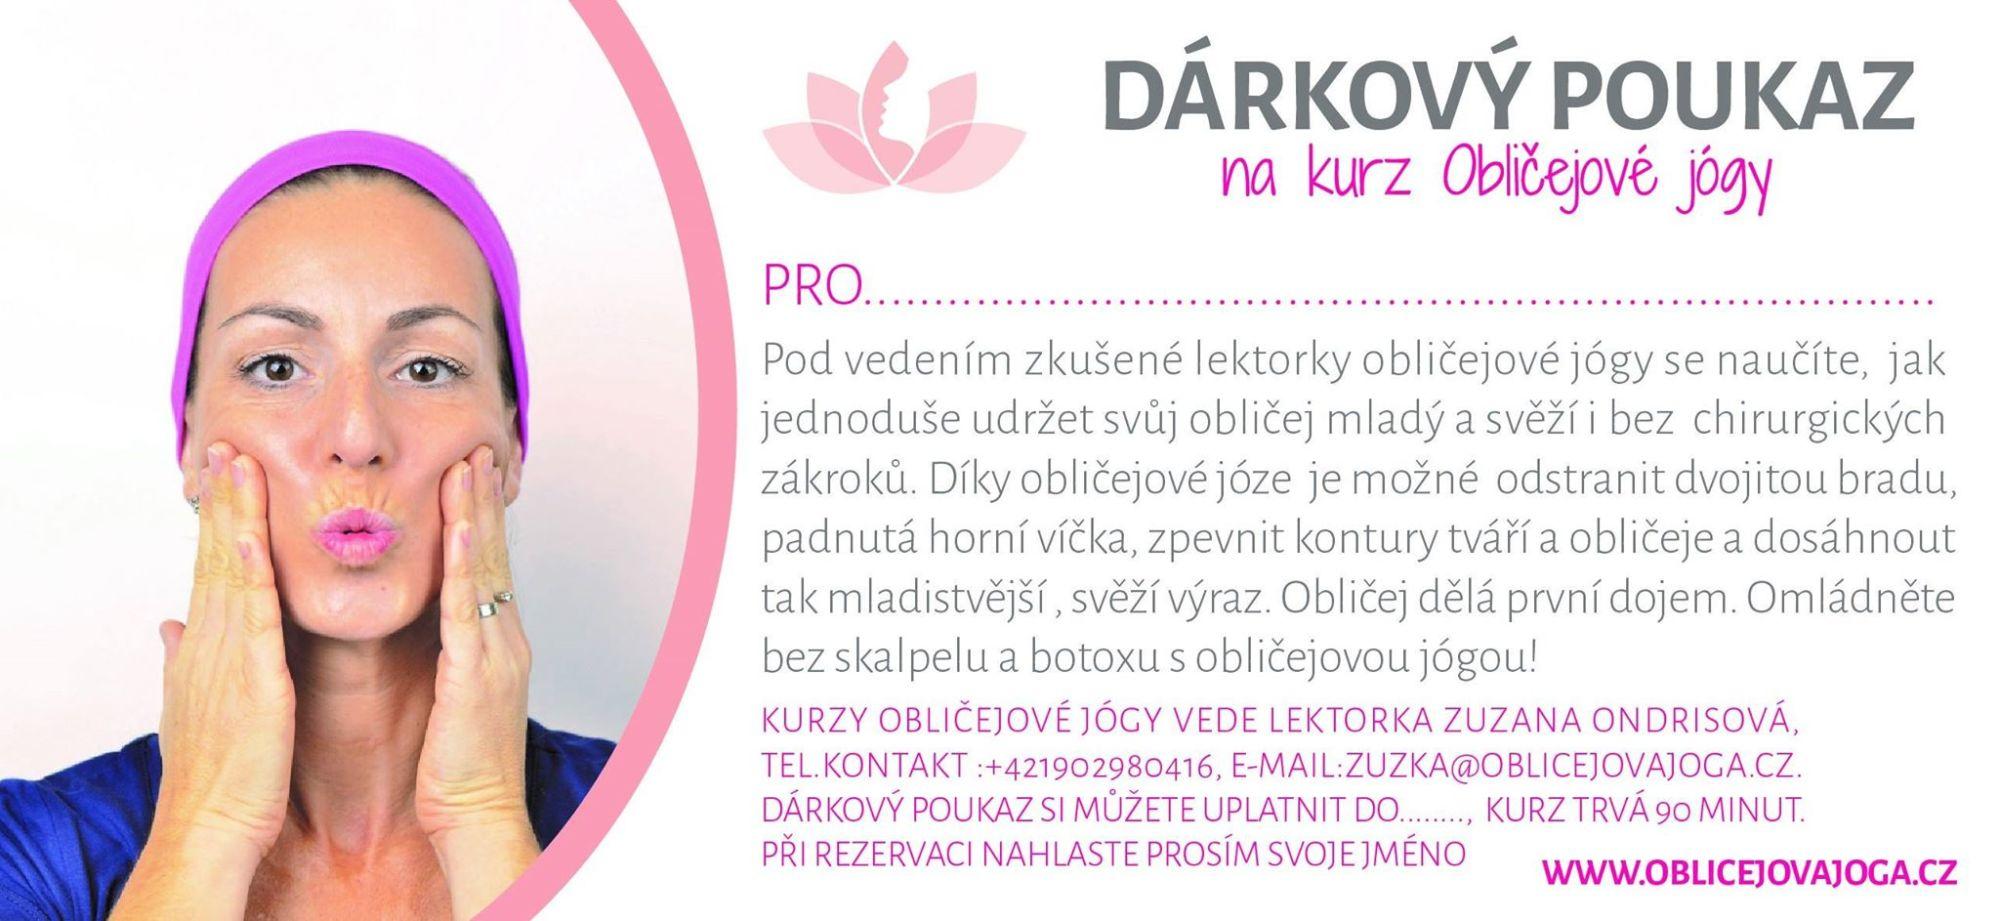 darkovy poukaz Oblicejova joga/Oblicejova gymnastika